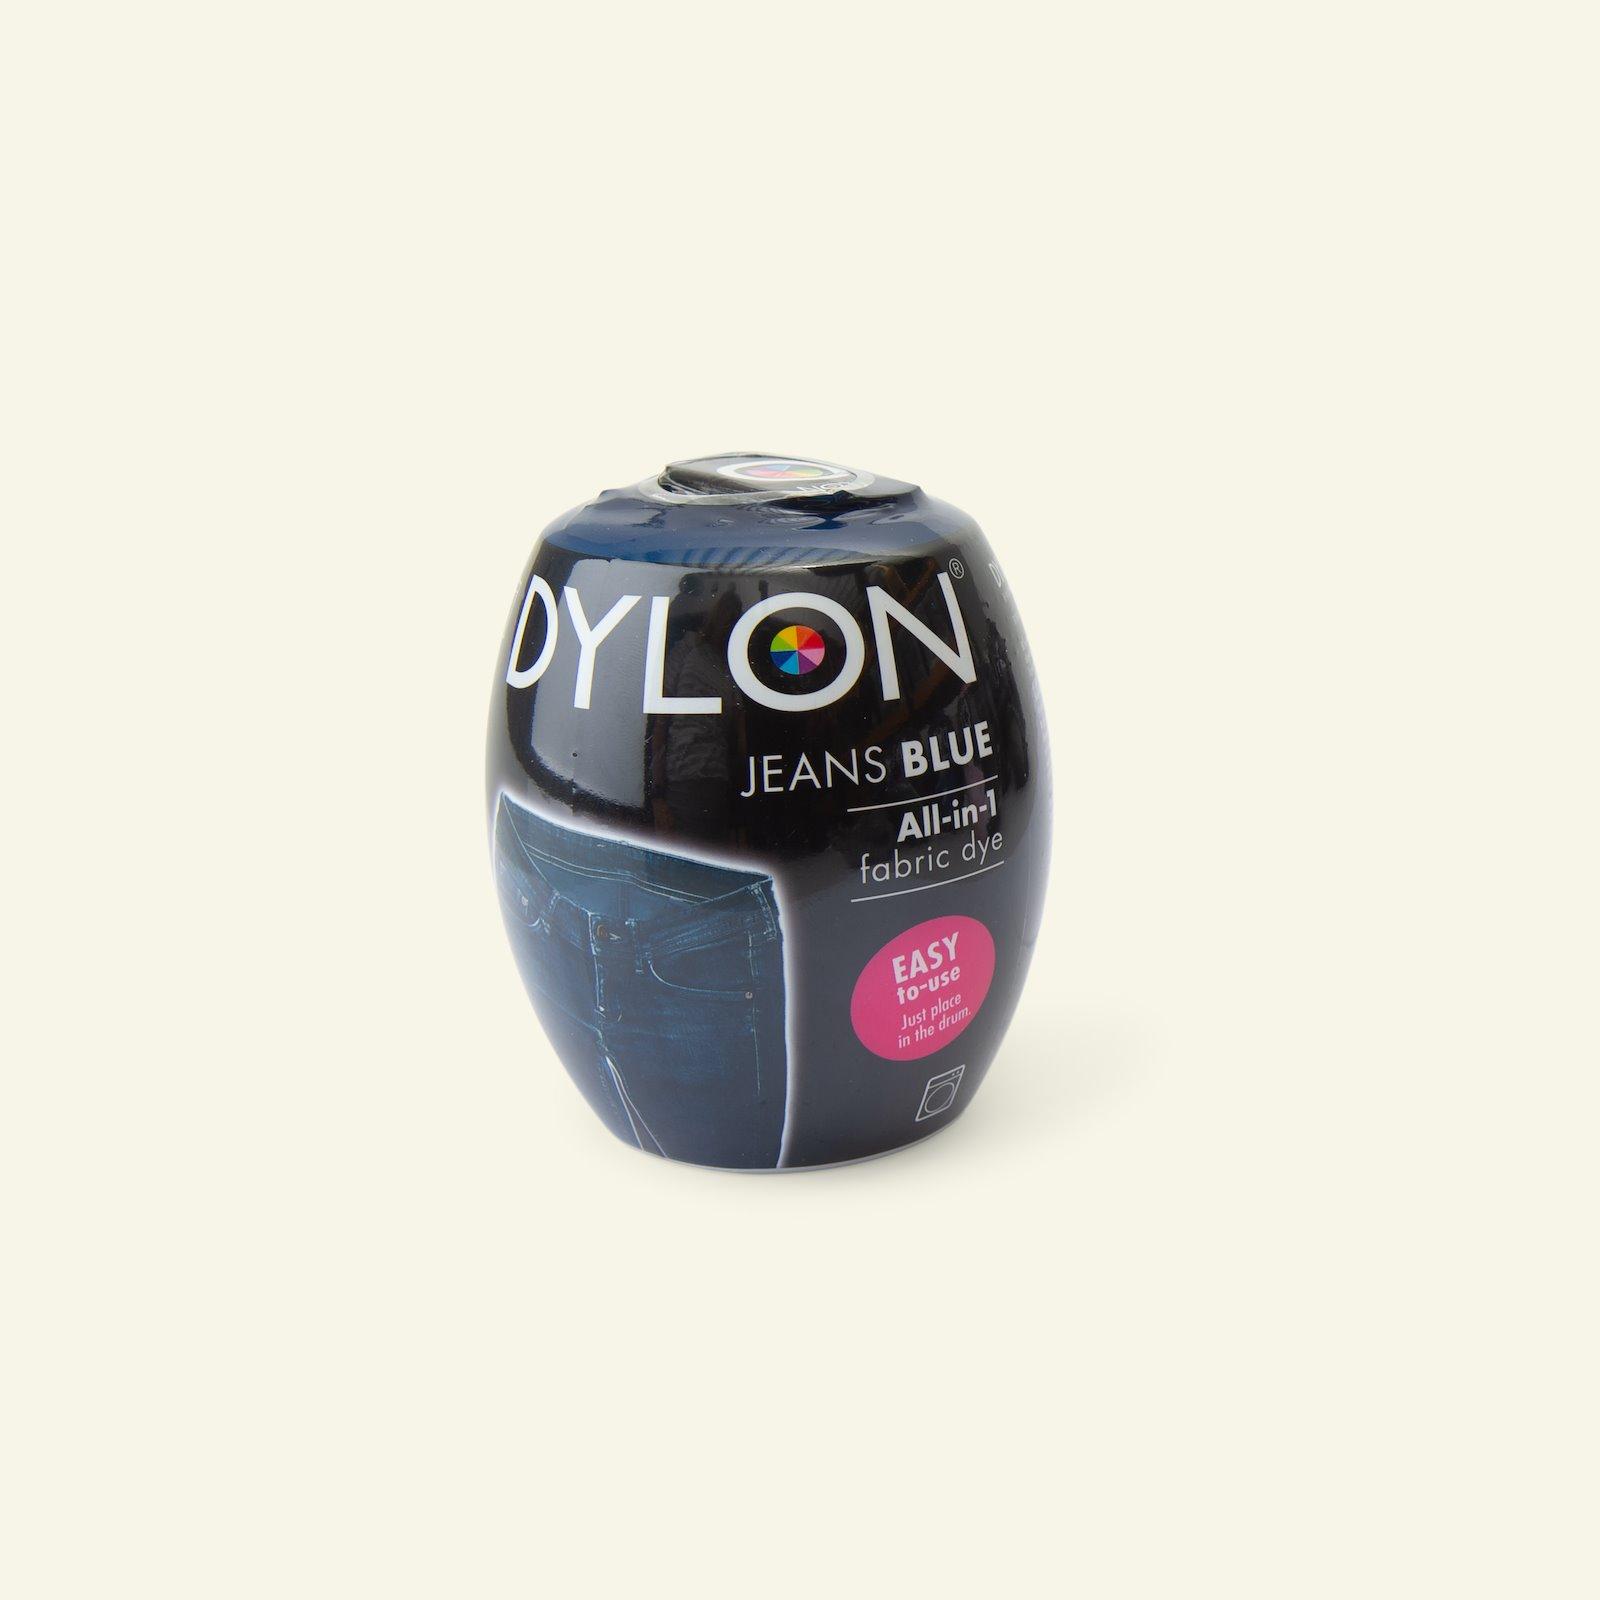 Dylon fabric dye for machine dark blue 29711_pack_b